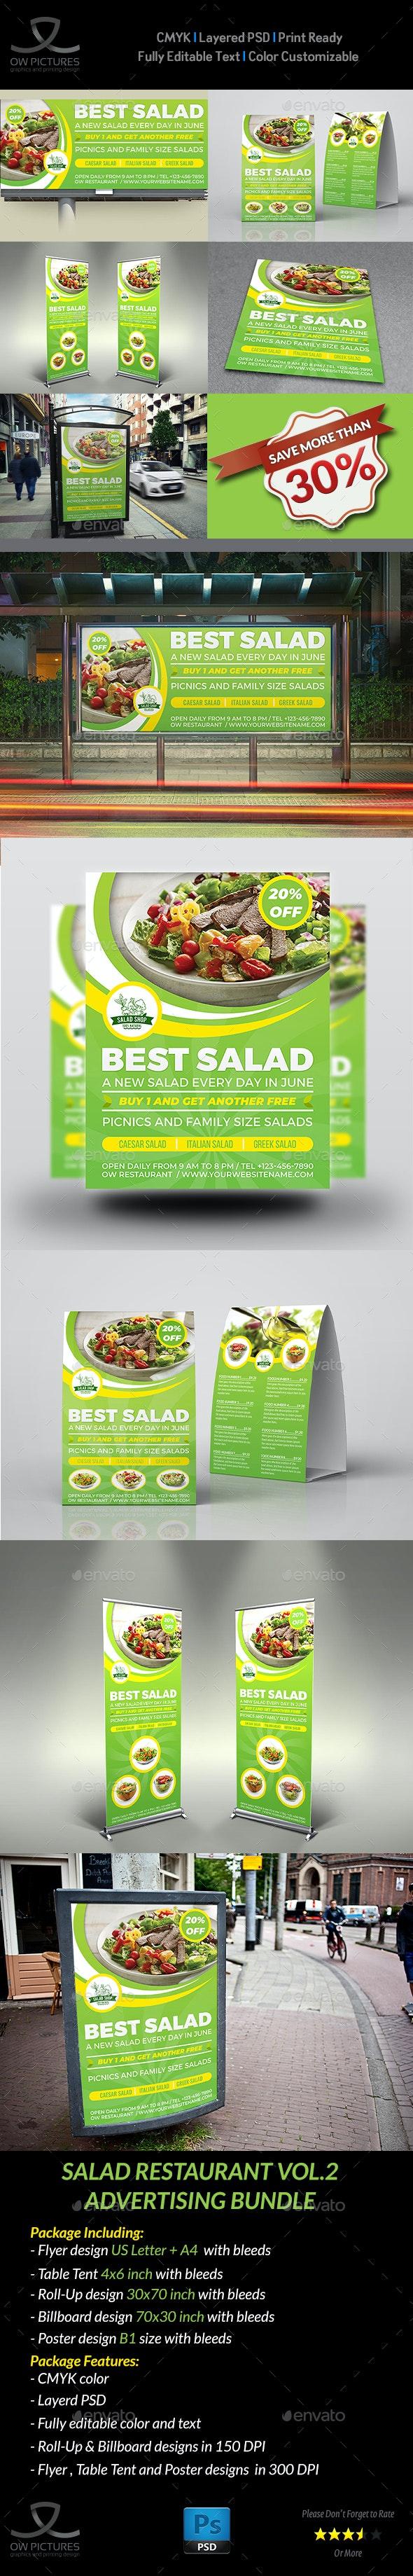 Salad Restaurant Advertising Bundle Vol.2 - Signage Print Templates